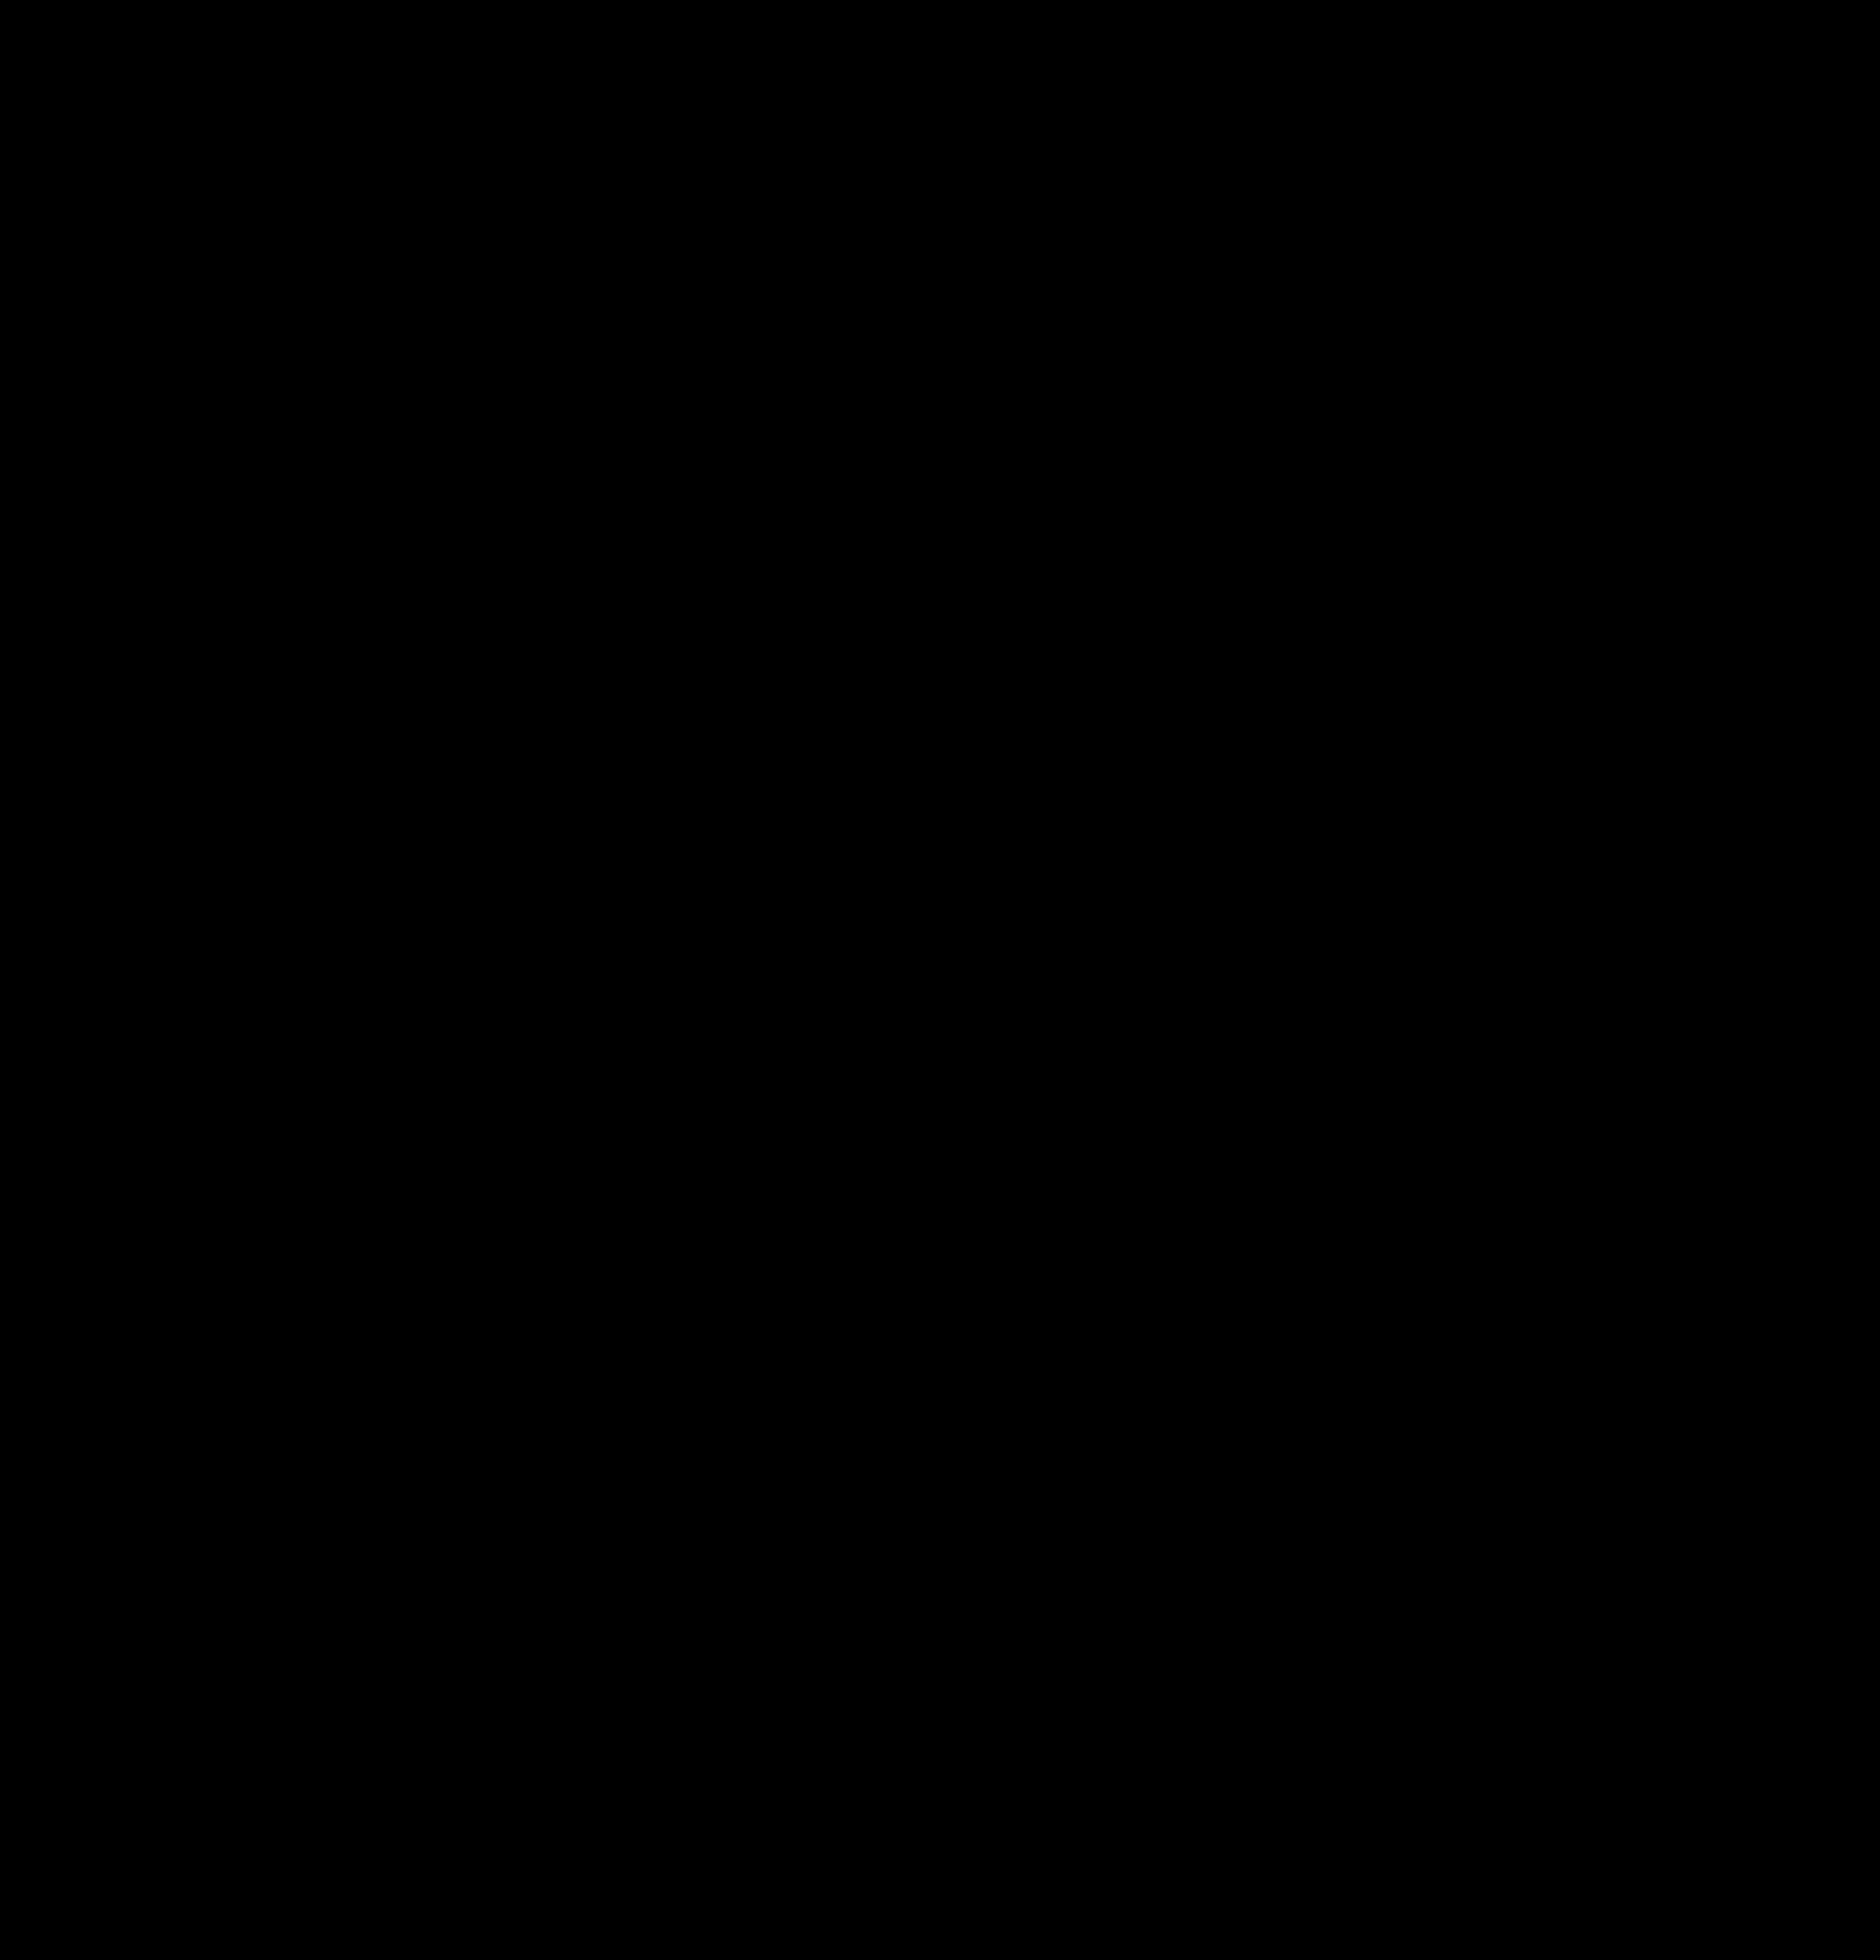 Abstract big image png. Clipart boat symbol